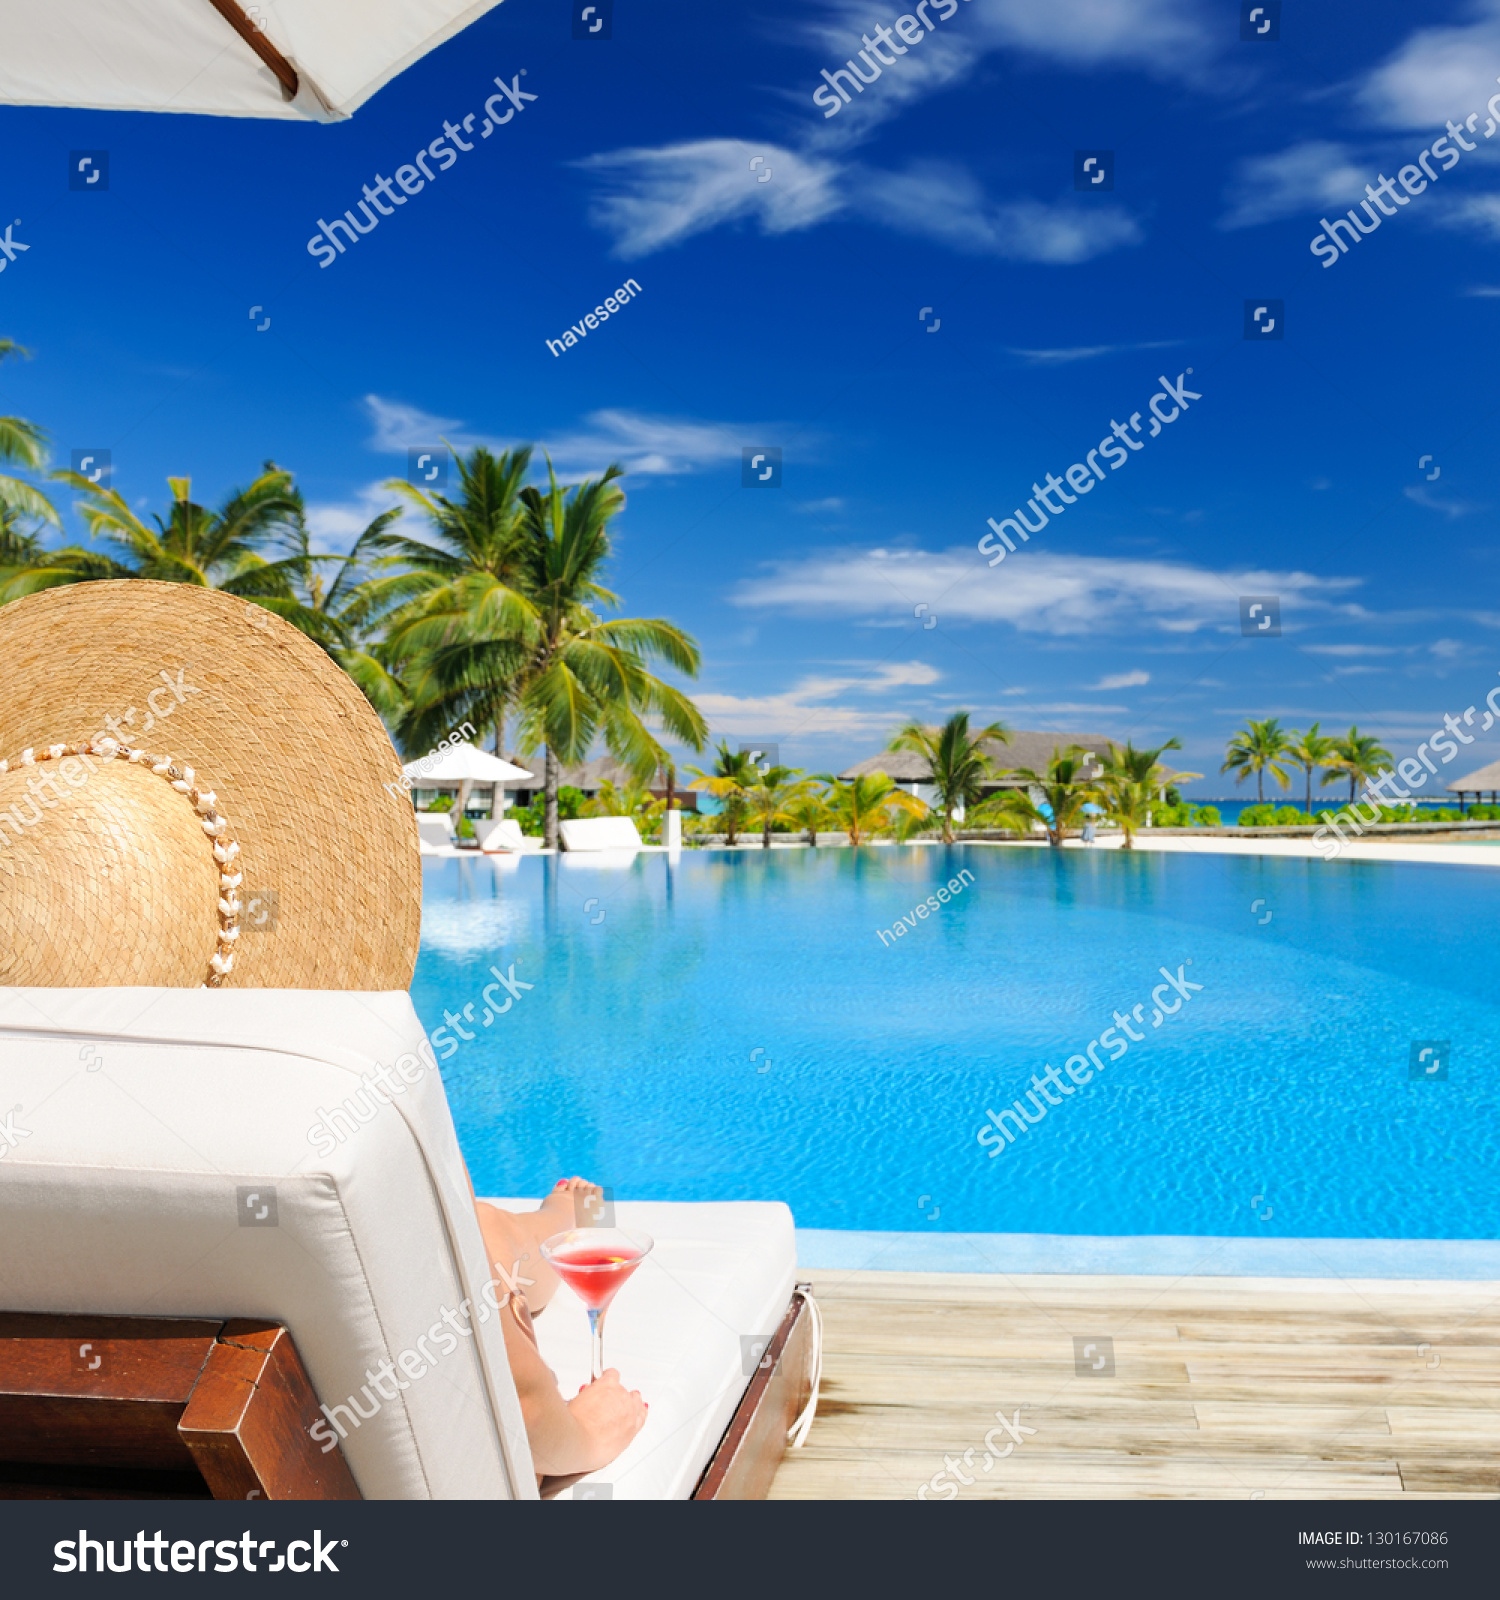 Woman Hat Relaxing Poolside Cosmopolitan Cocktail Stock